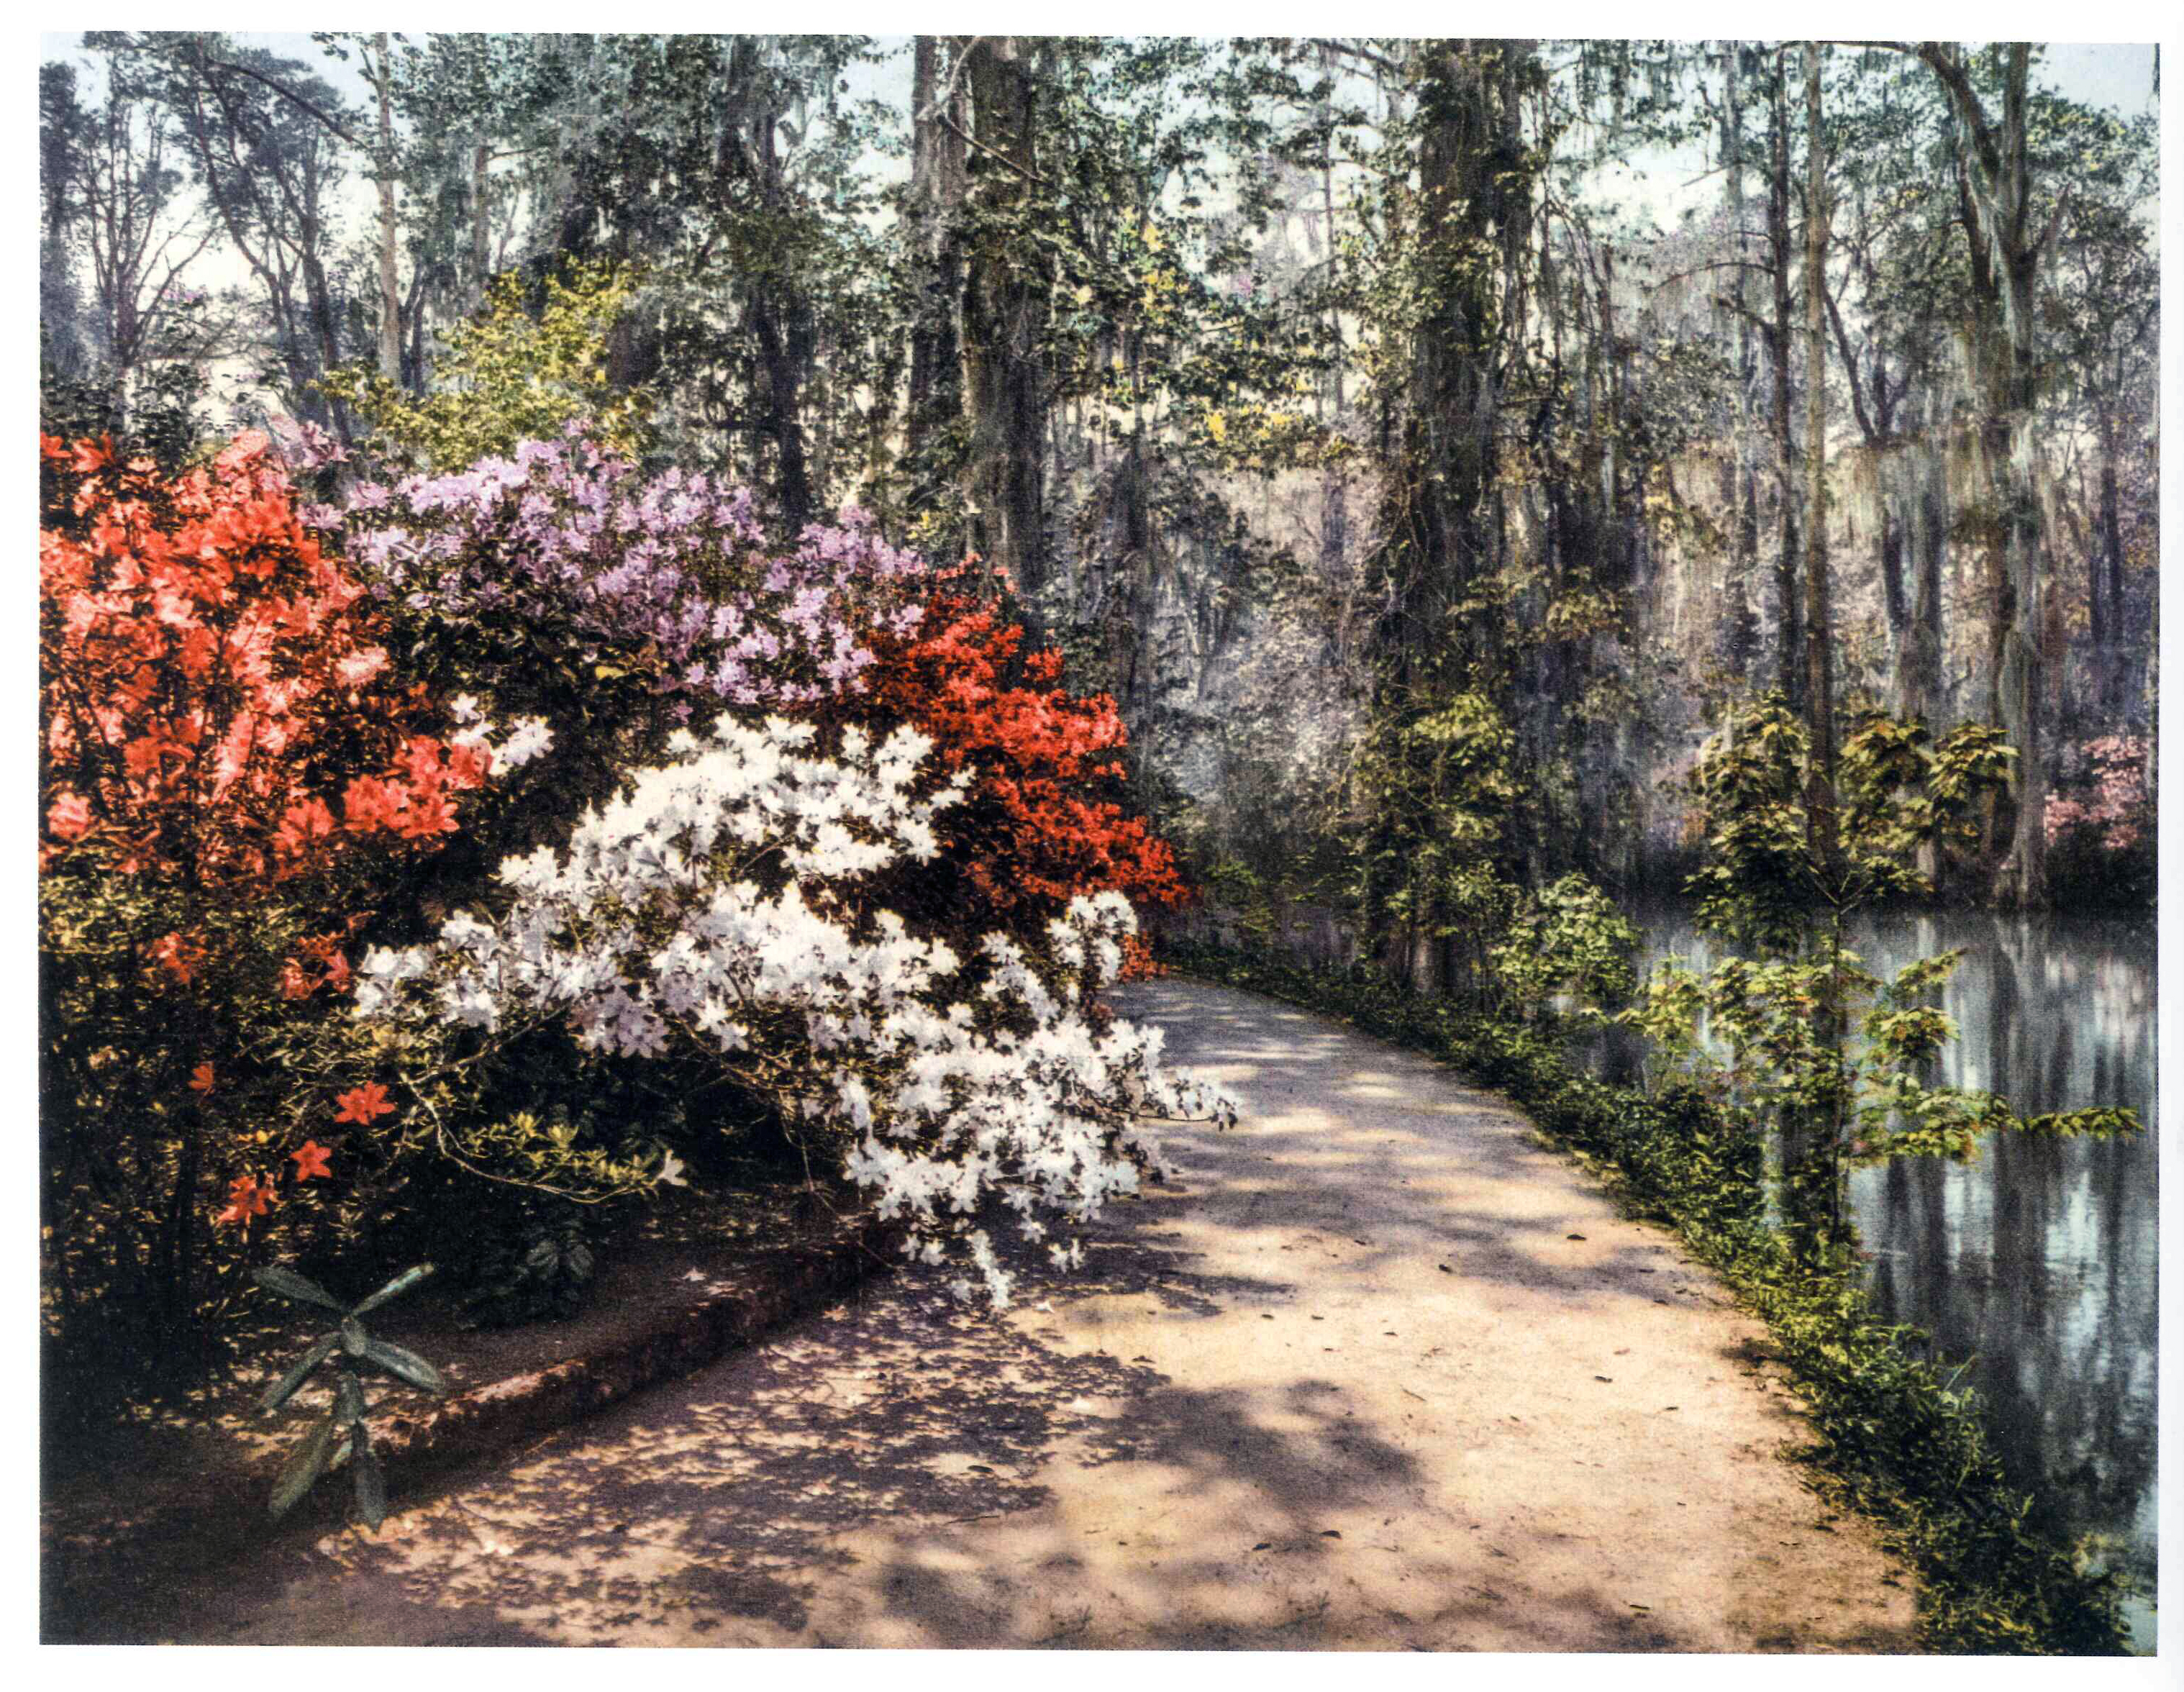 Gardens by the lake on the Magnolia Plantation, South Carolina (photochrom)